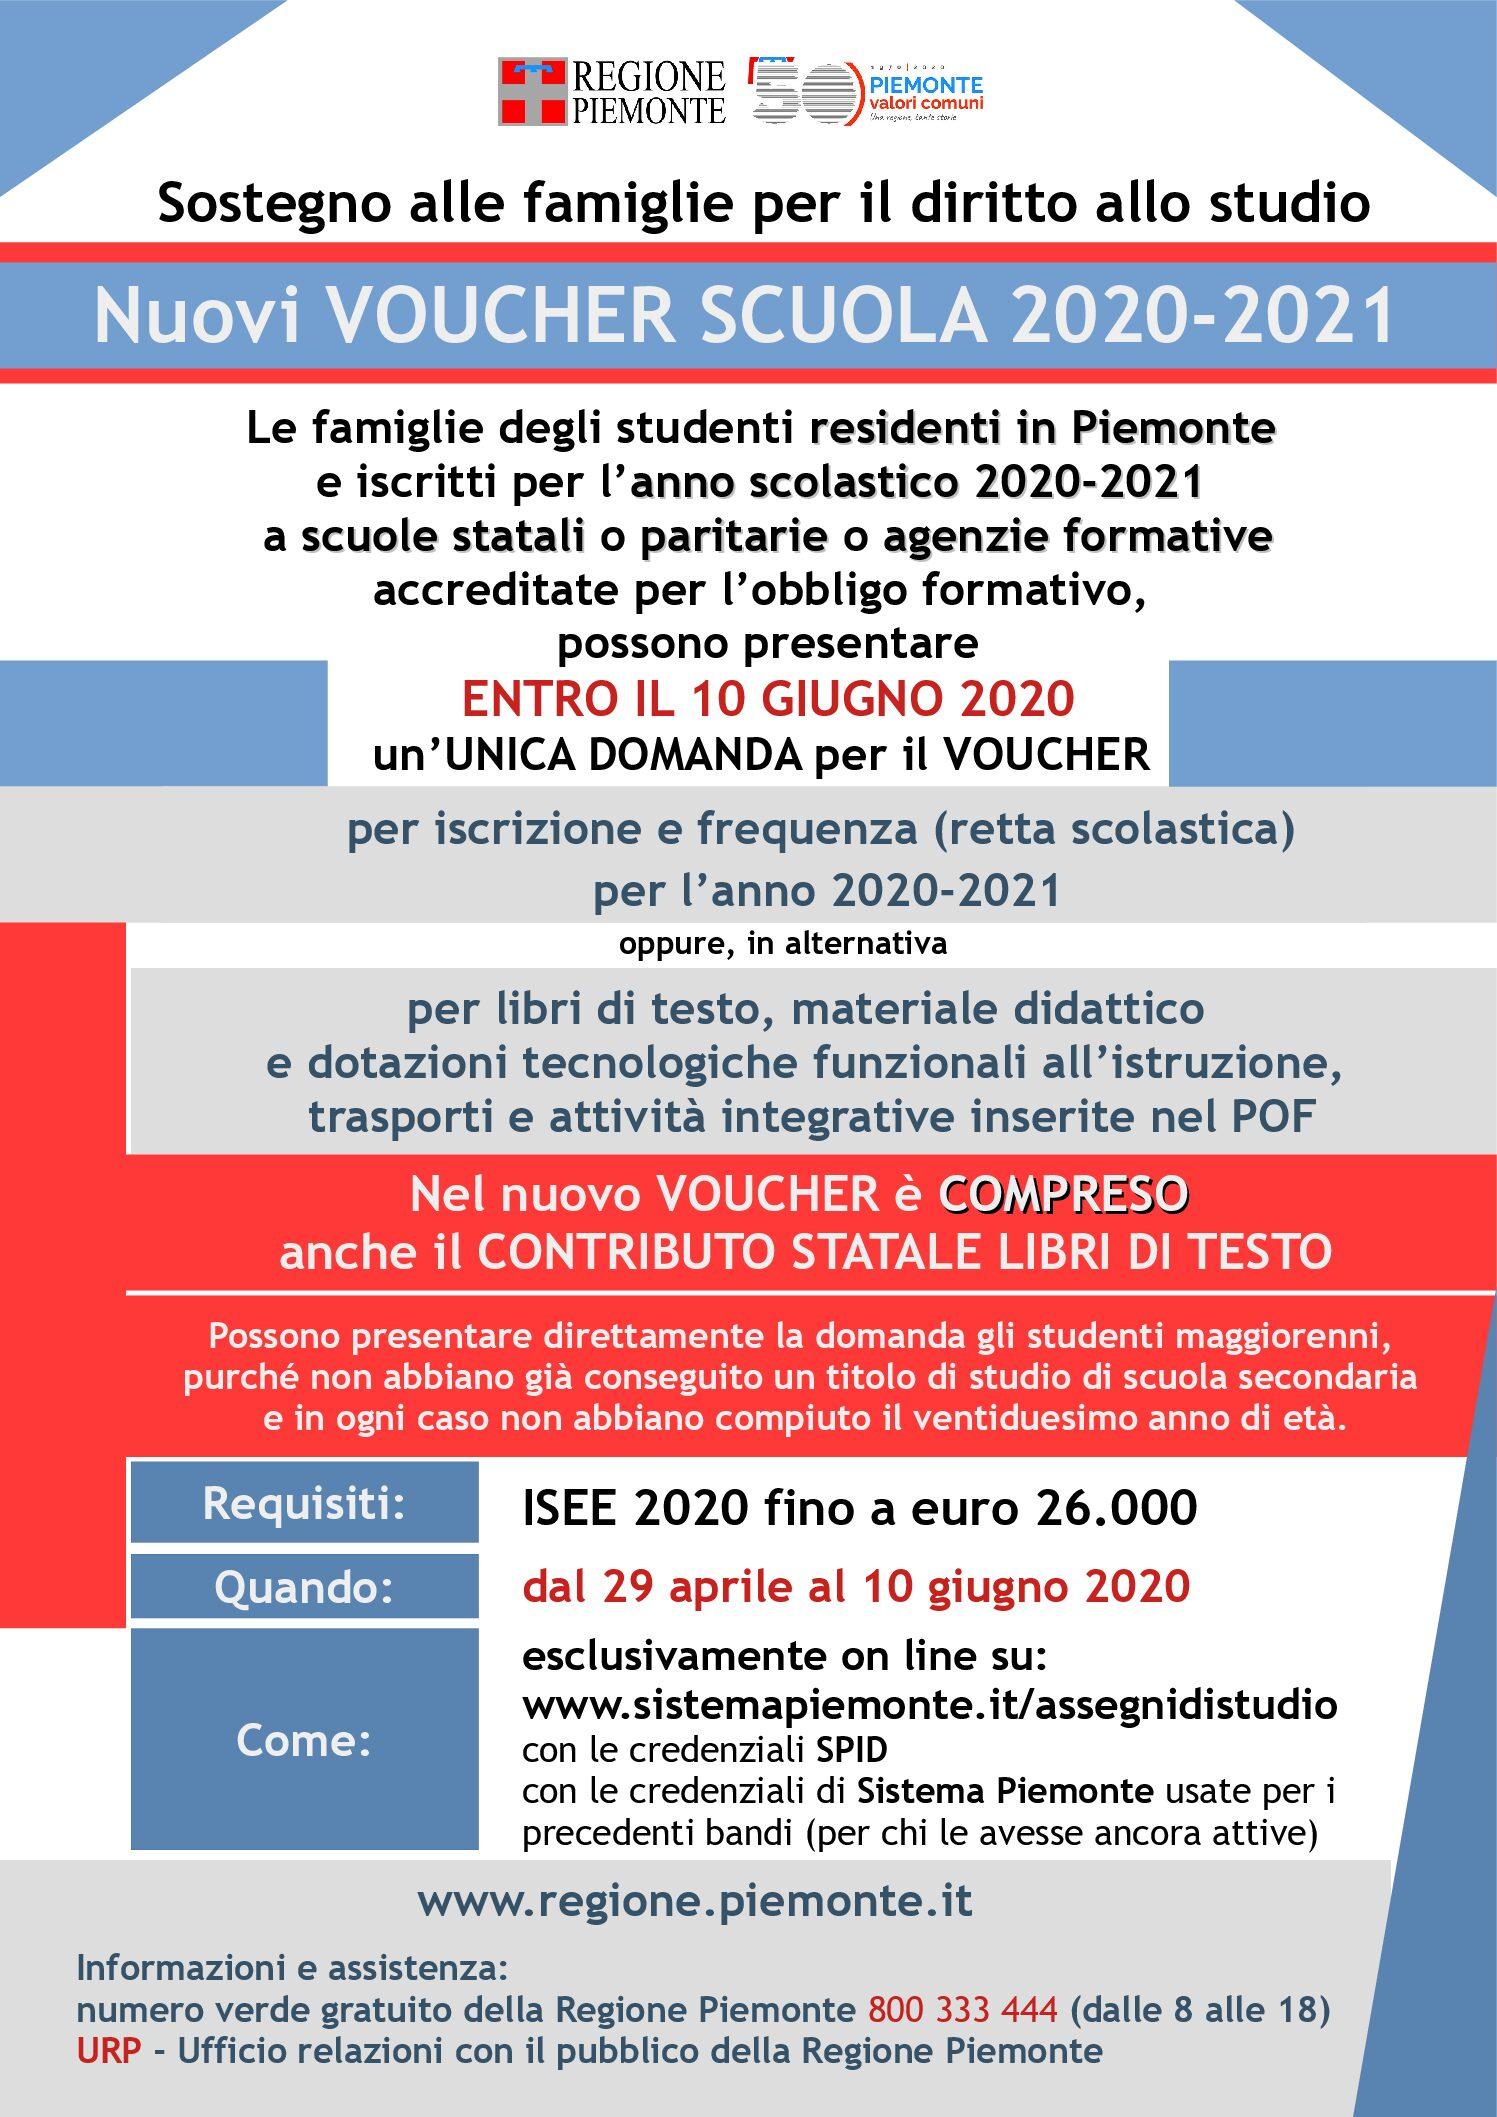 VOUCHER SCUOLA 2020-2021